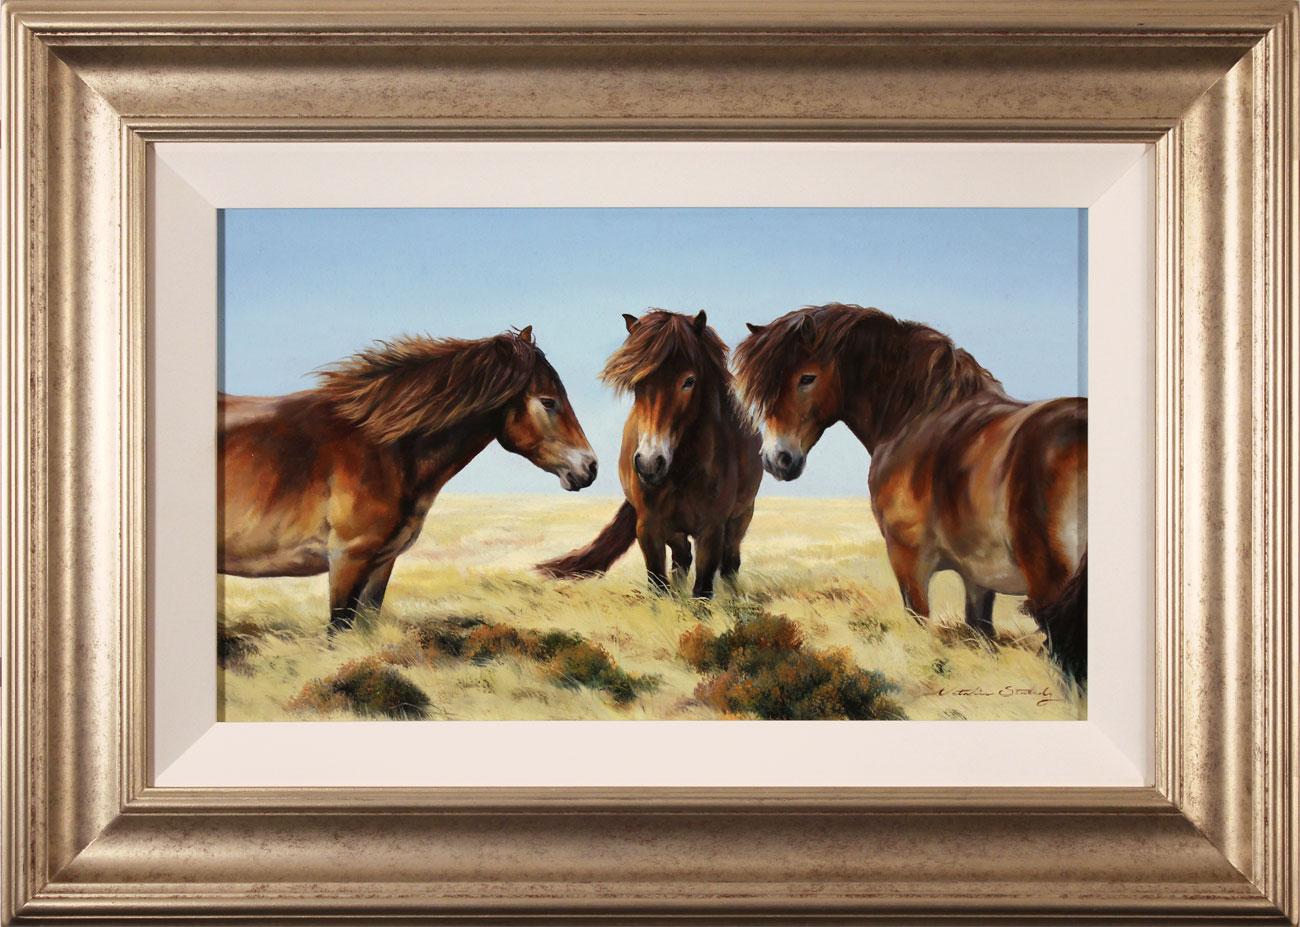 Natalie Stutely, Original oil painting on panel, Moorland Ponies, click to enlarge